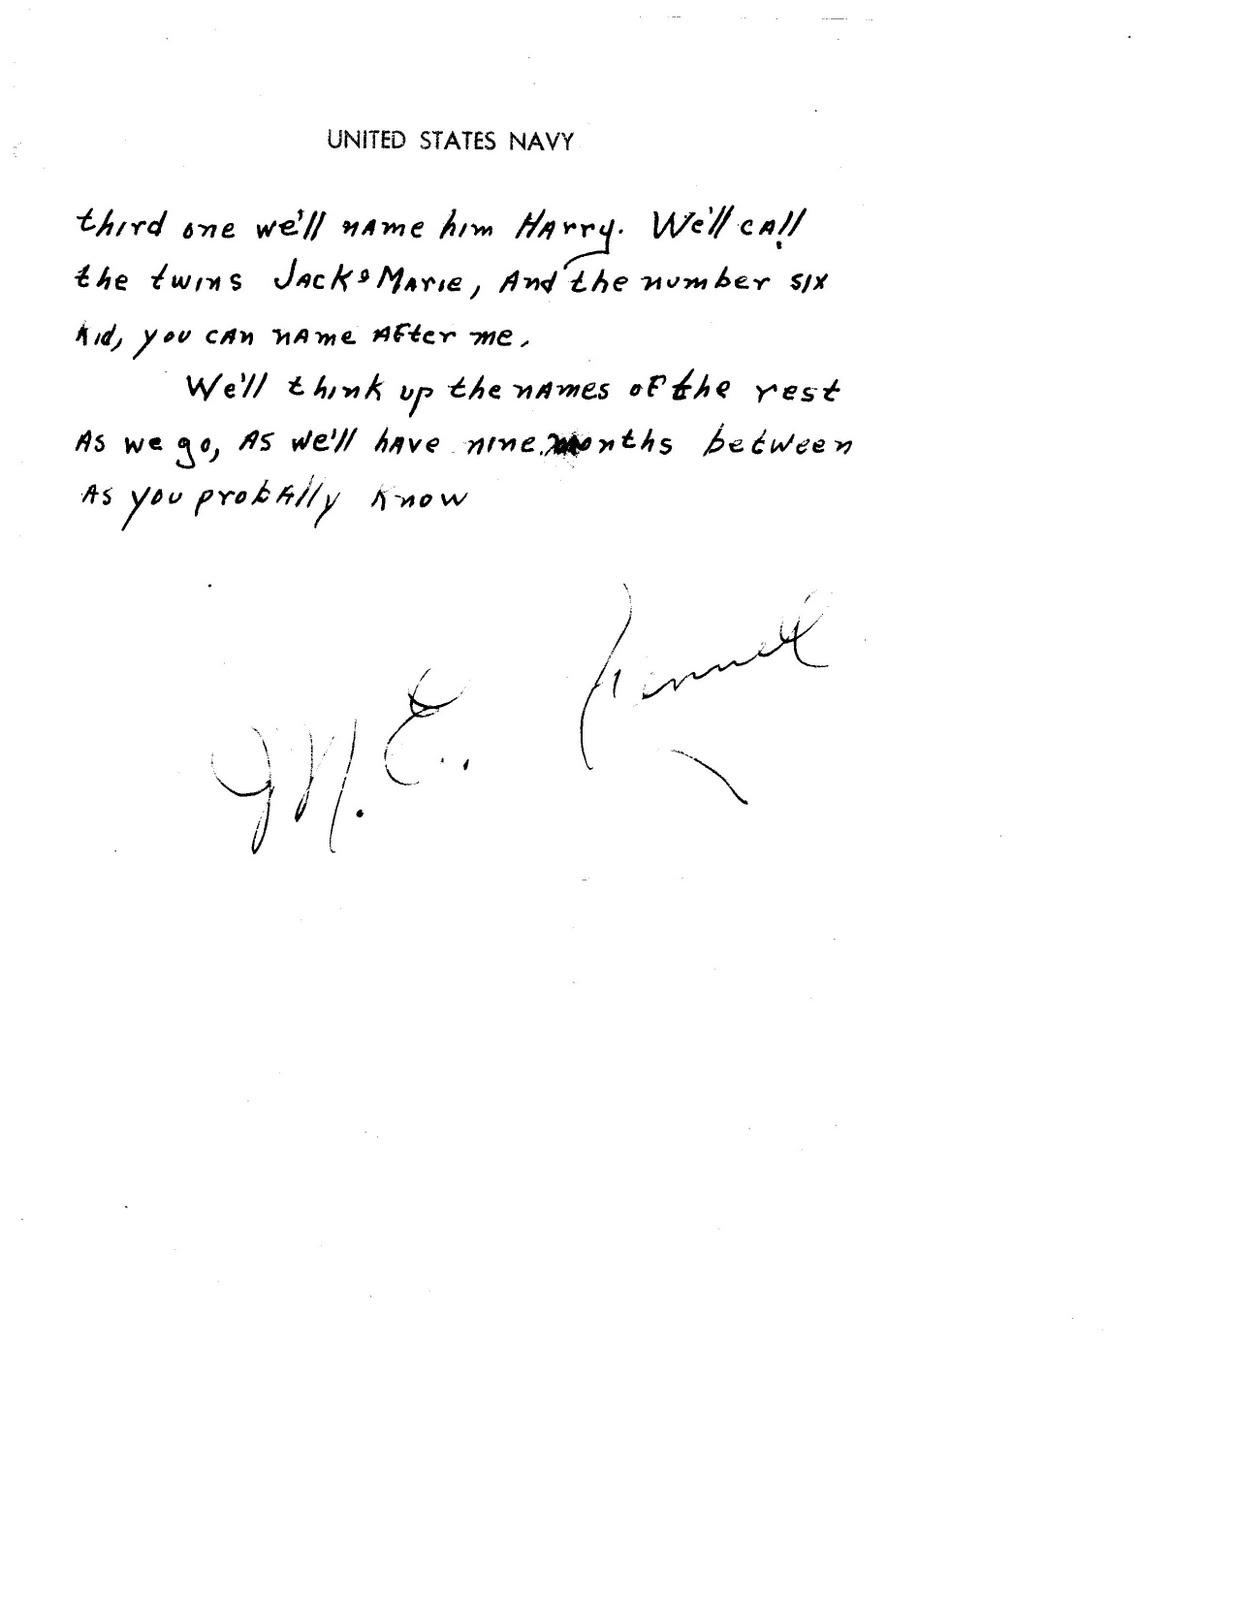 To End A Professional Letter Letter Ring Finger Studio: Love Letter #3 Love  Letter